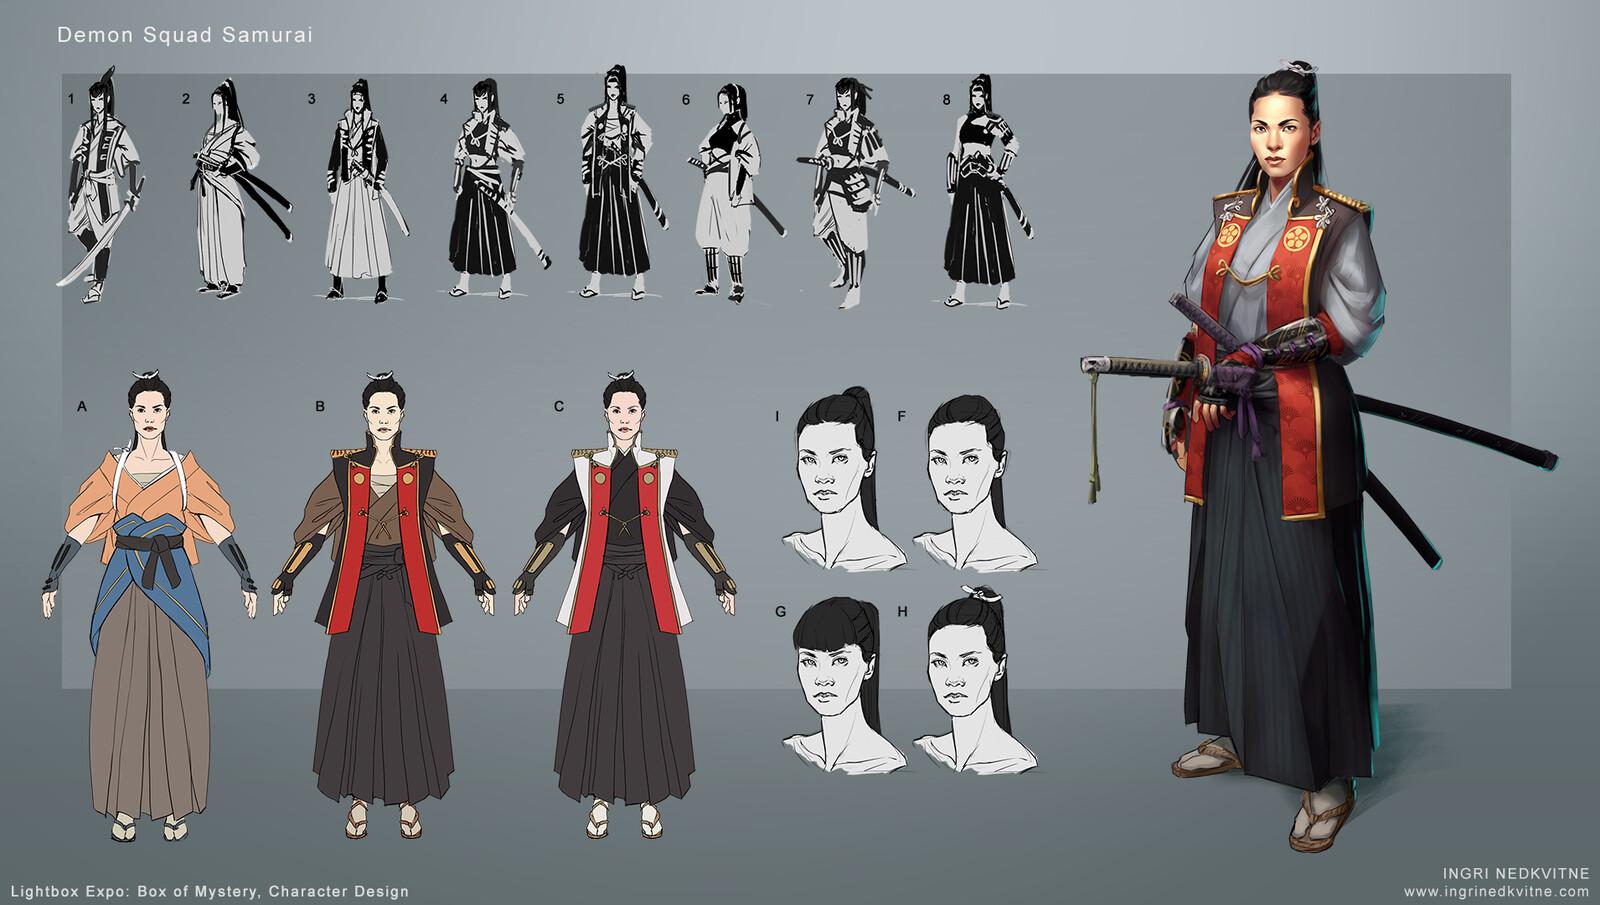 Iteration Process for Demon Squad Samurai